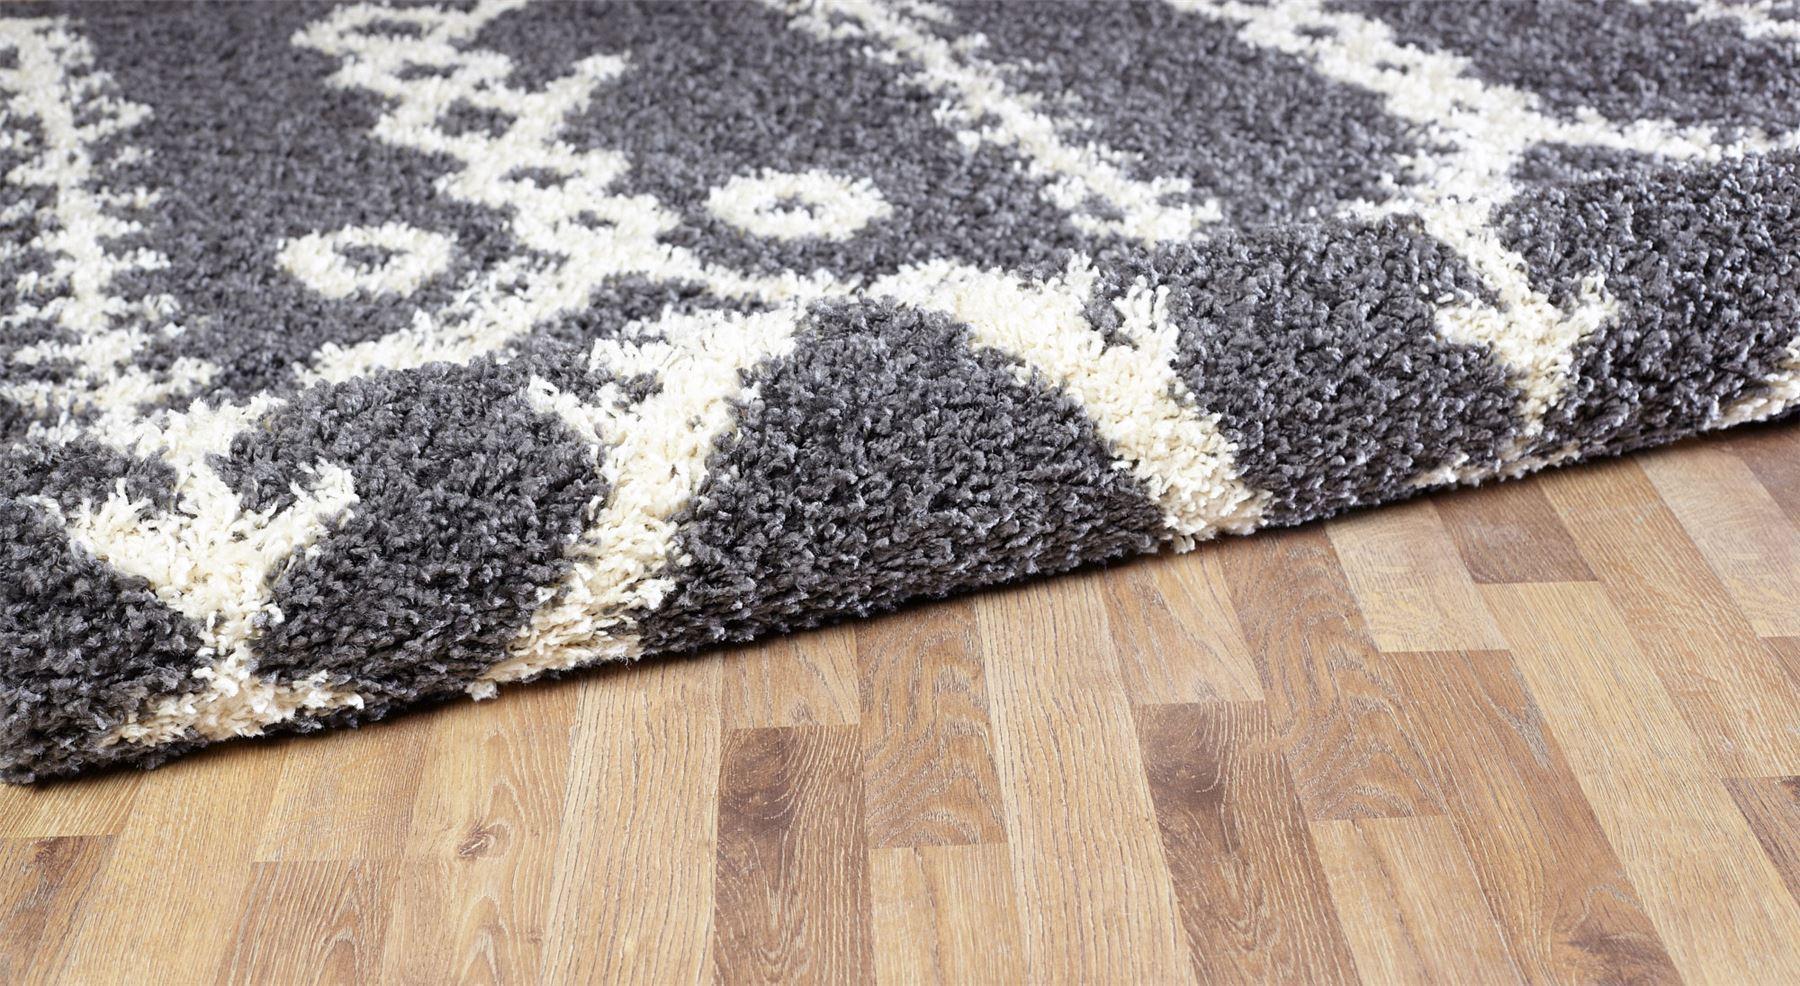 Moroccan-Shaggy-Area-Rug-Grey-White-Black-Soft-Carpet-Traditional-Berber-Designs thumbnail 12